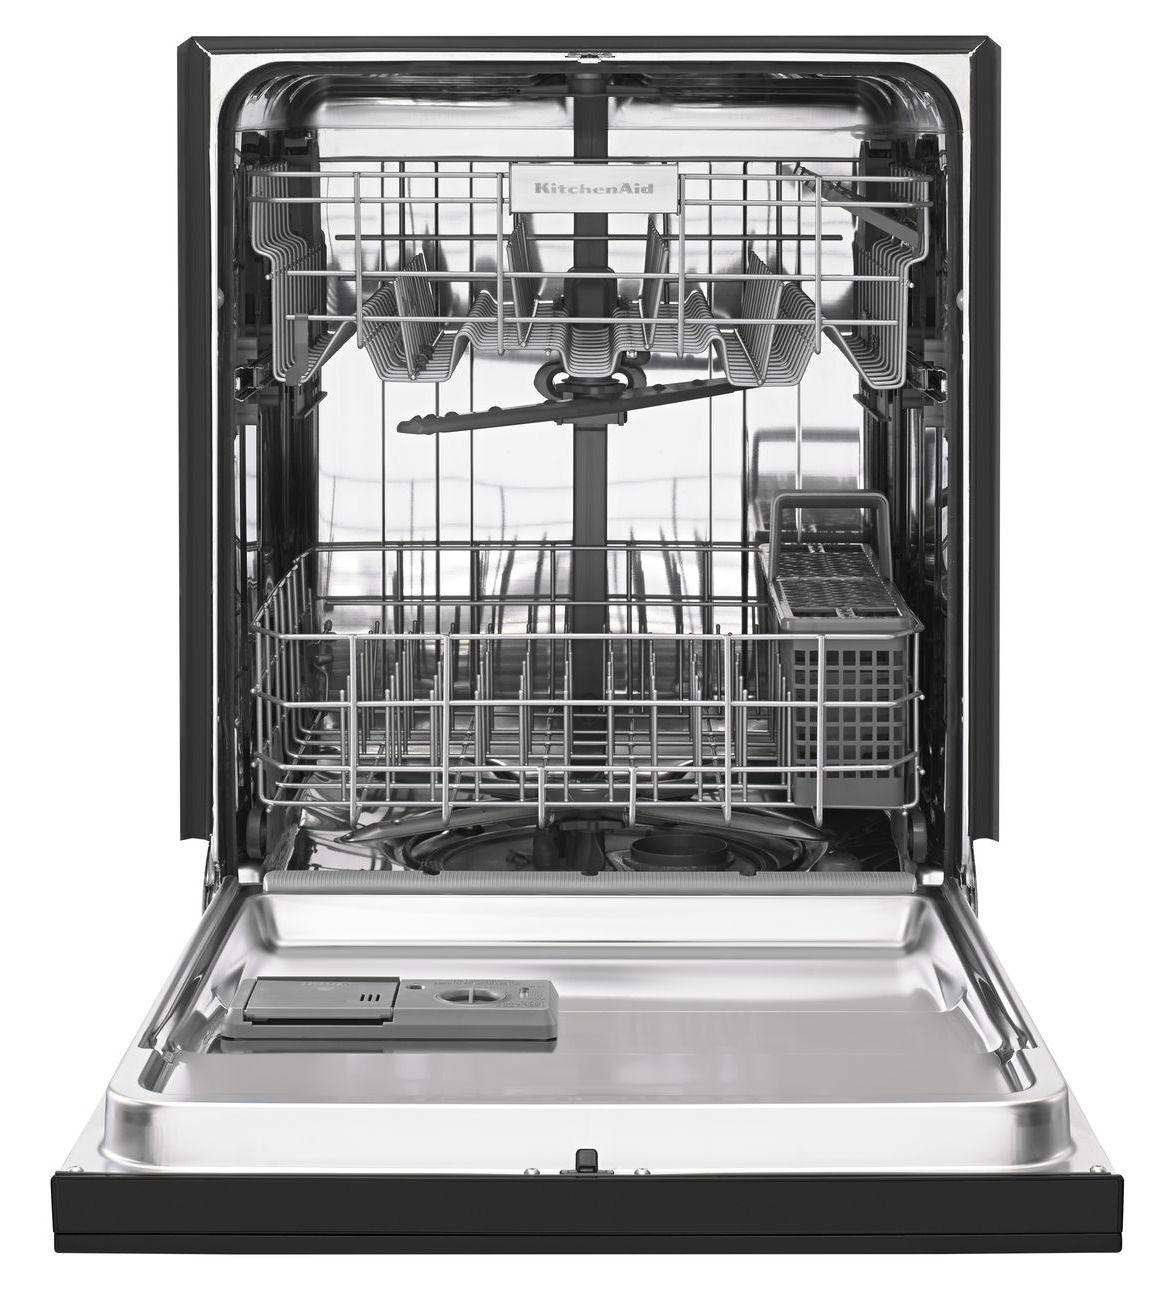 kitchenaid dishwashers with third rack